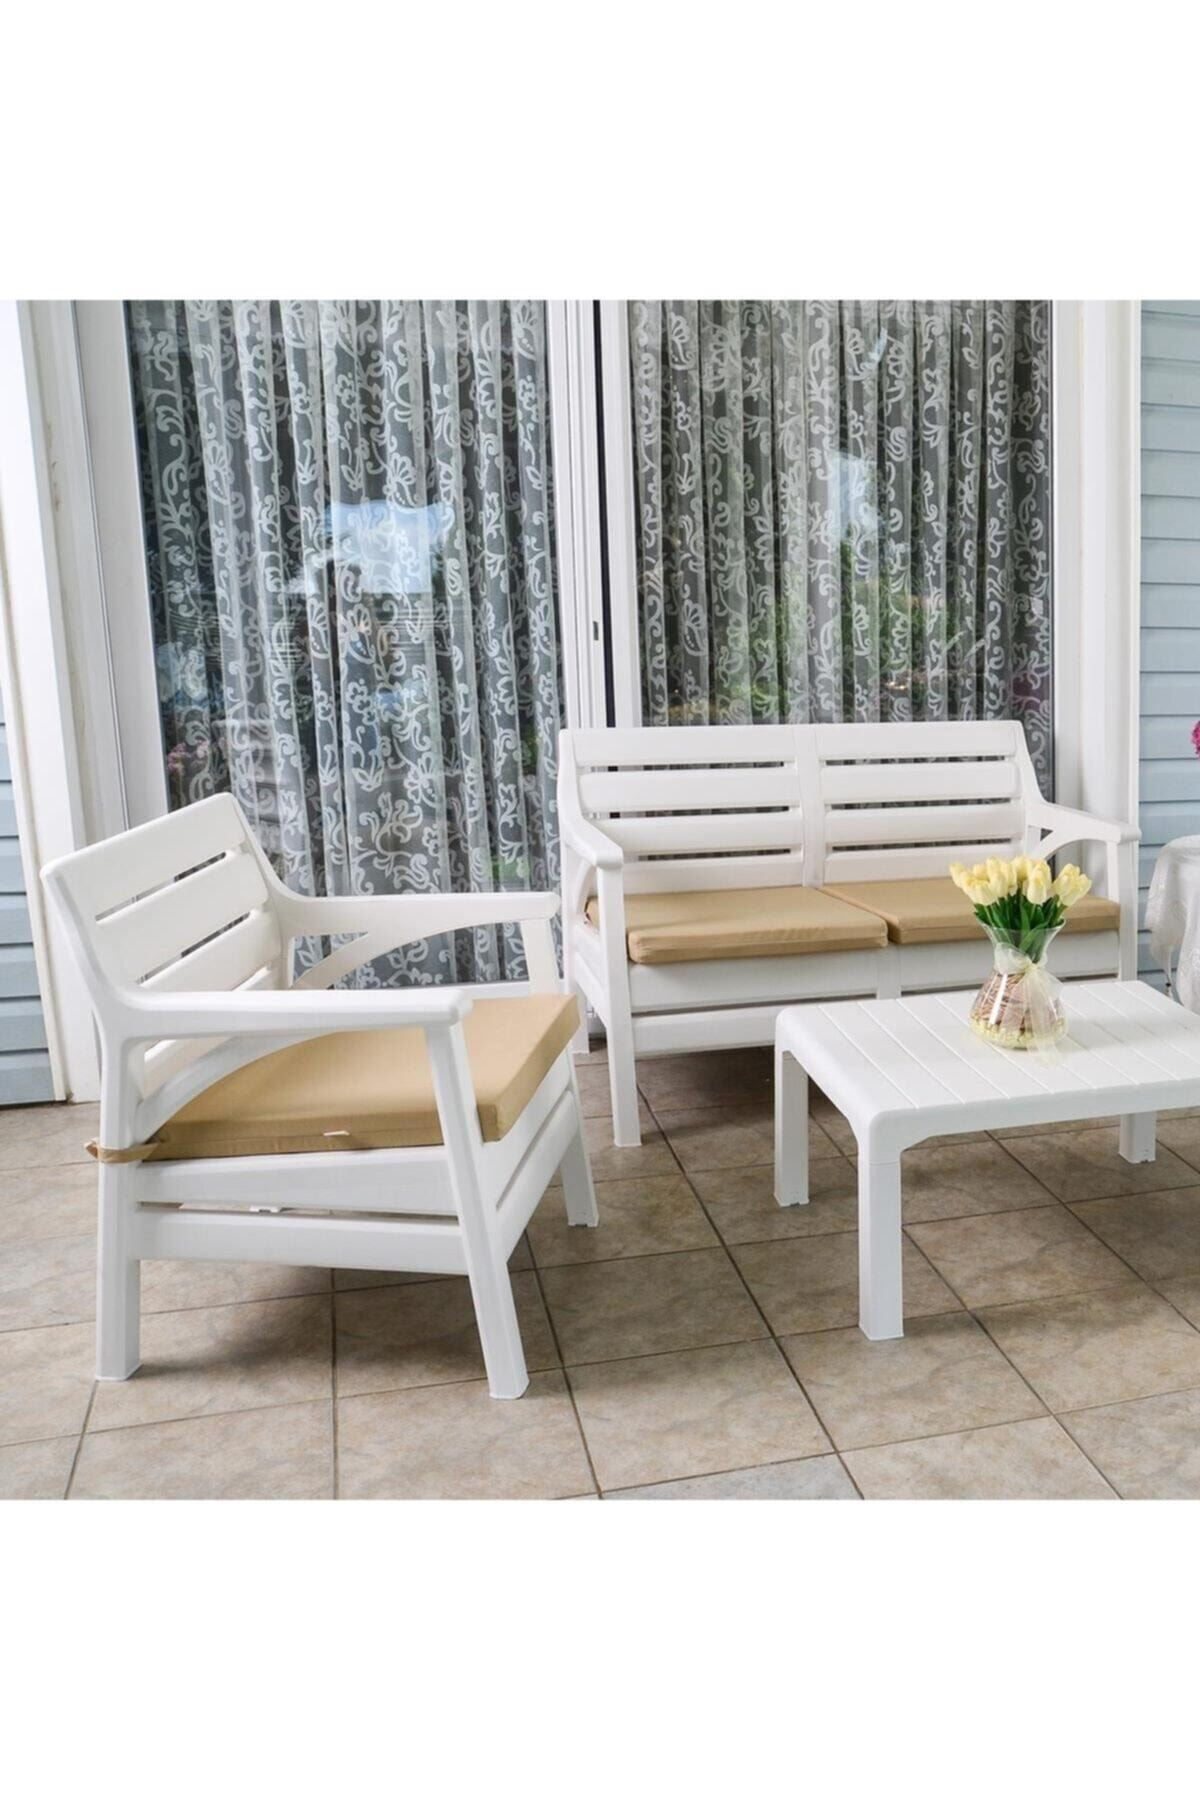 Miami Set Masa Takımı | Bahçe & Balkon Seti